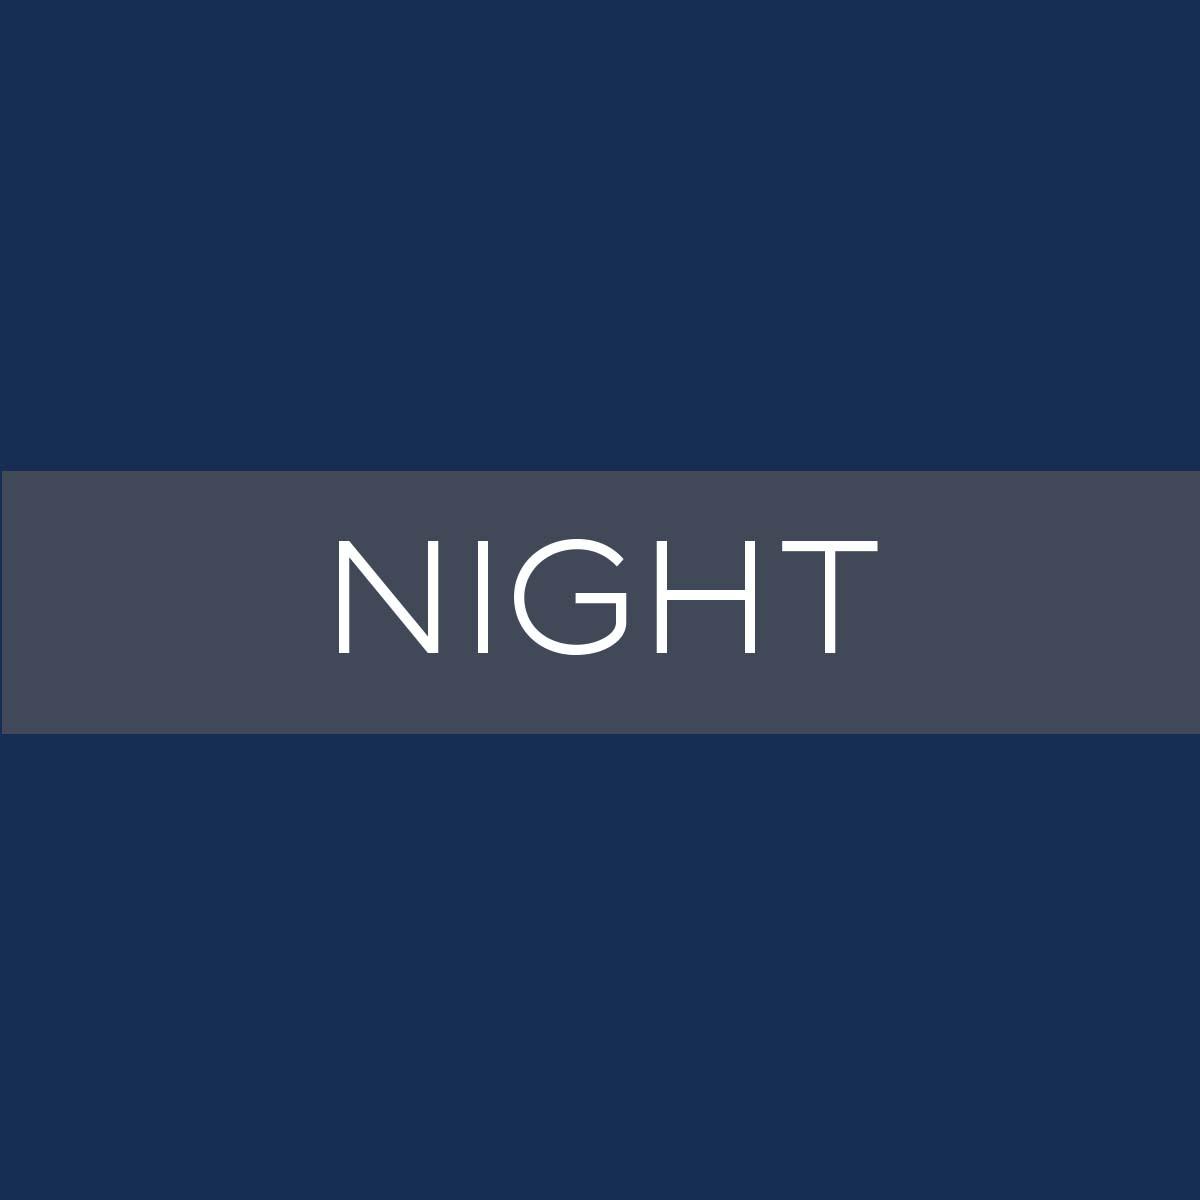 WNP_Night.jpg